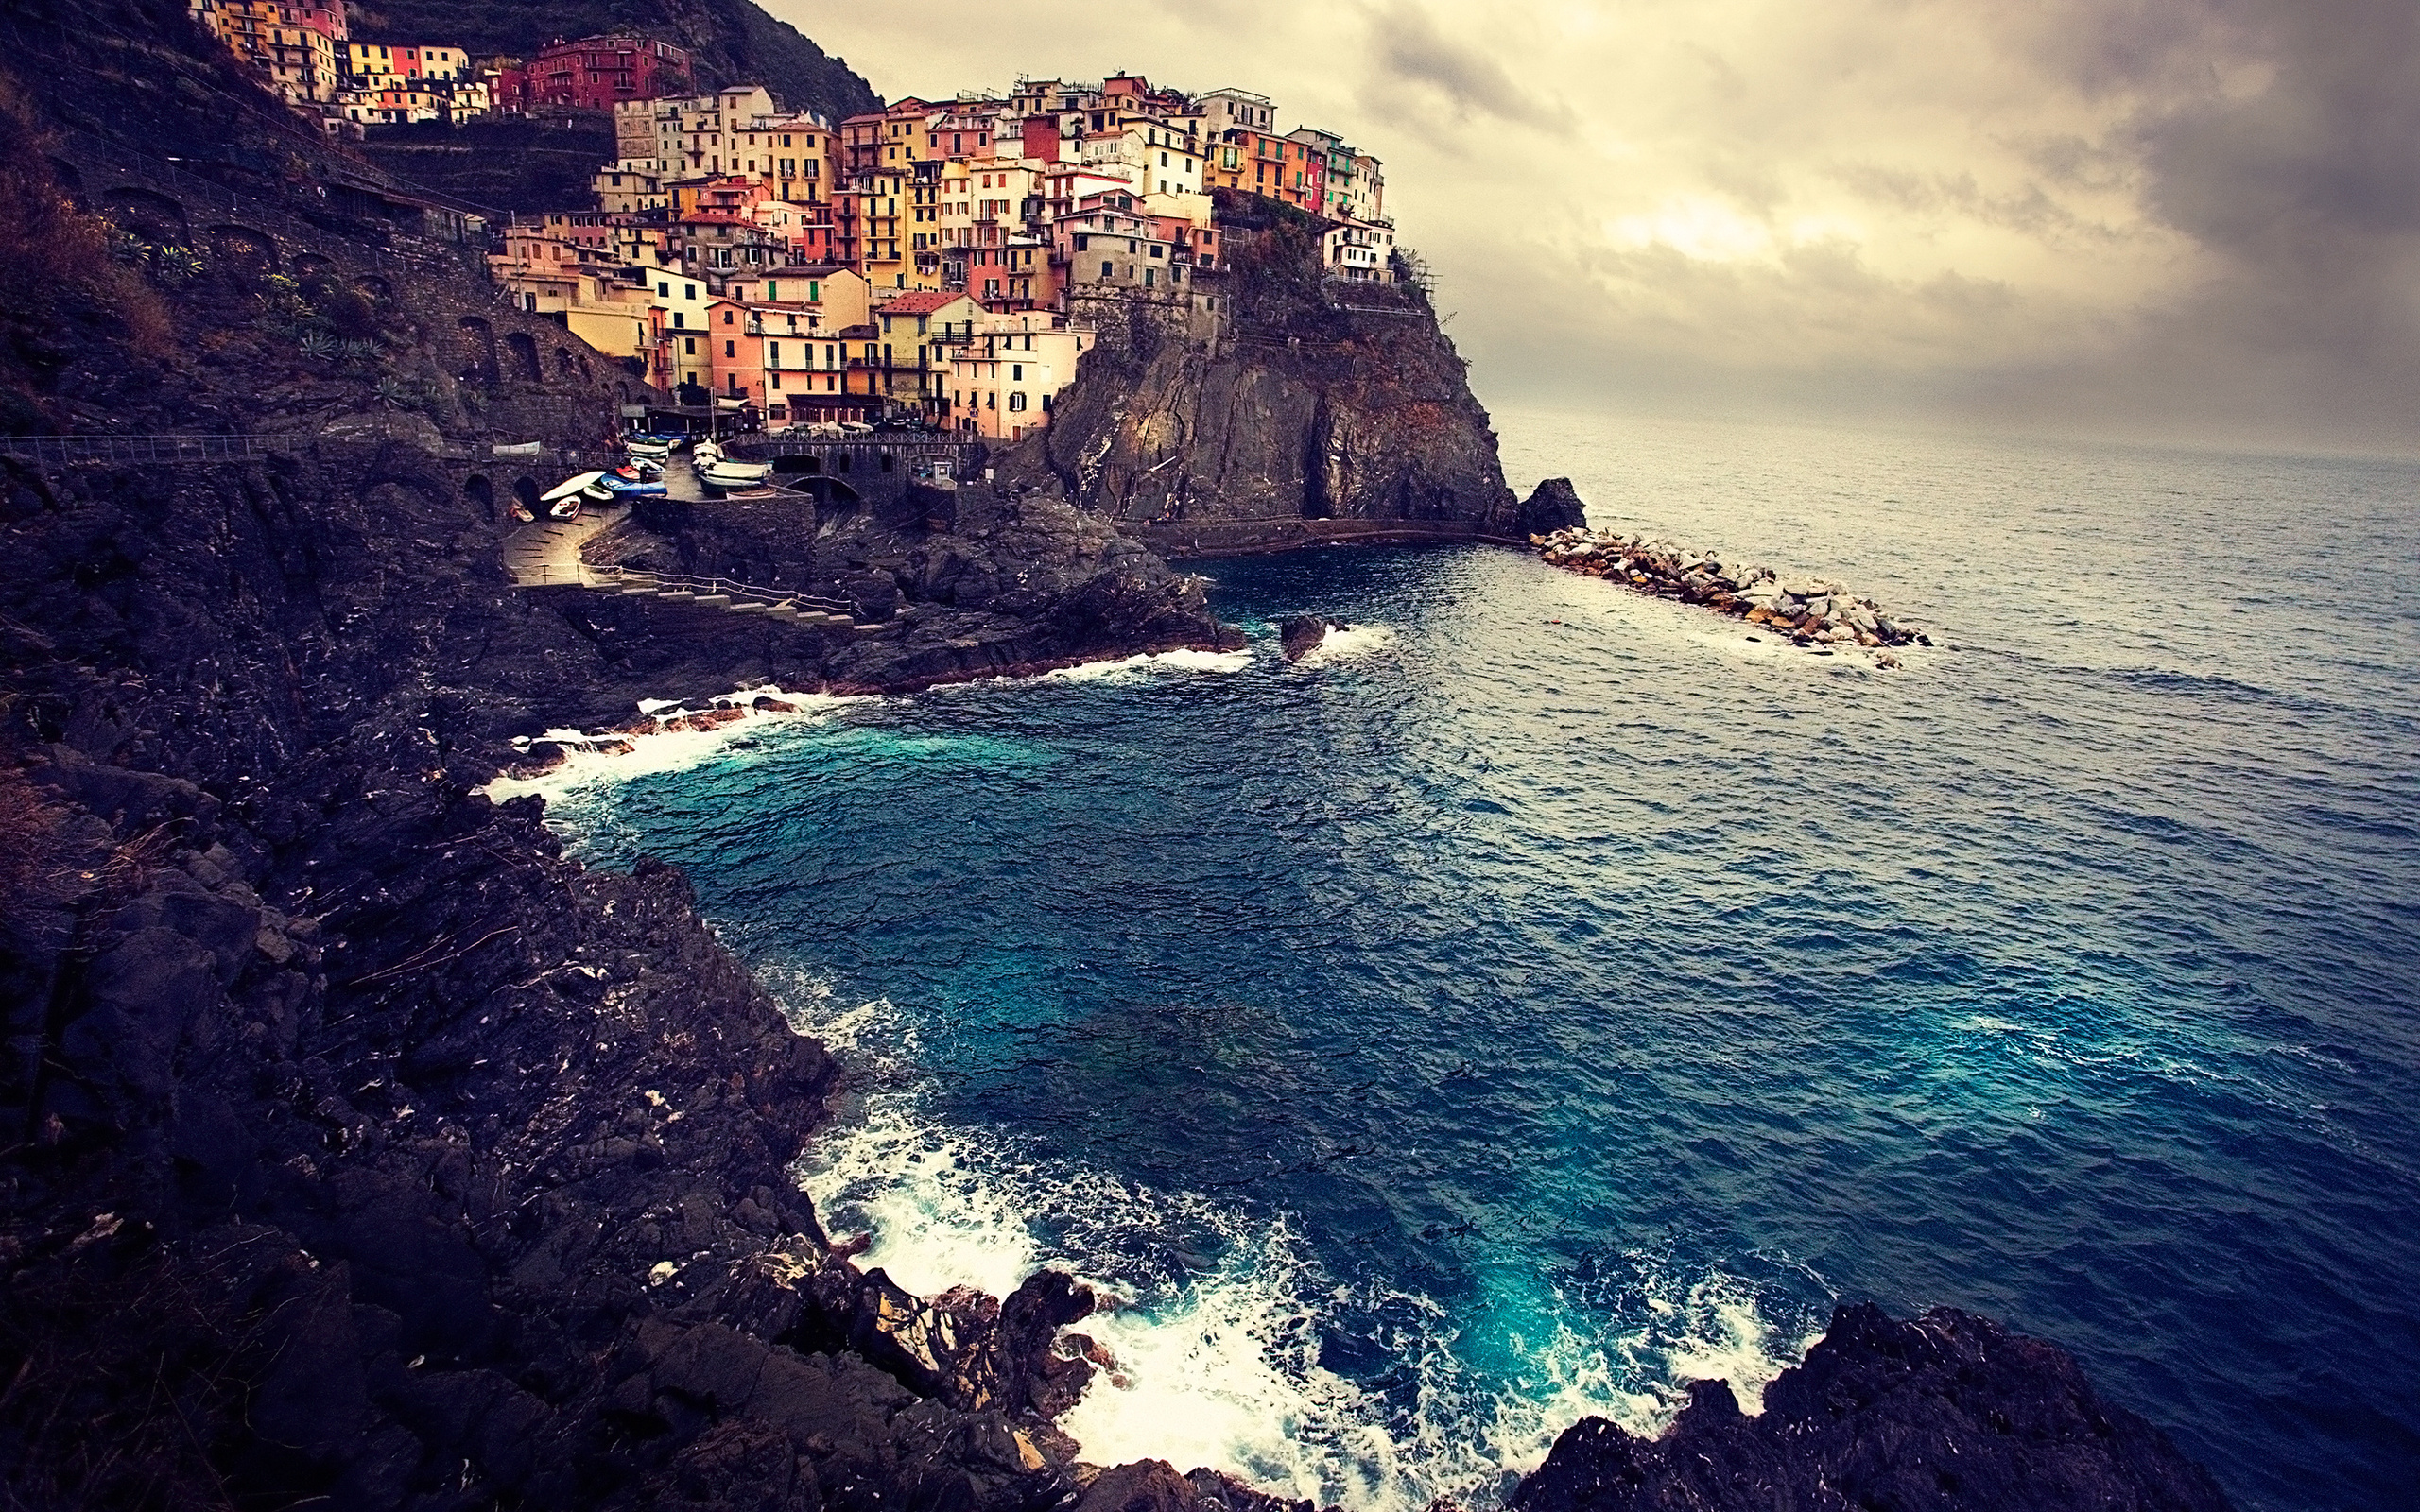 природа облака небо море Чинкве-Терре Италия  № 2798807 загрузить